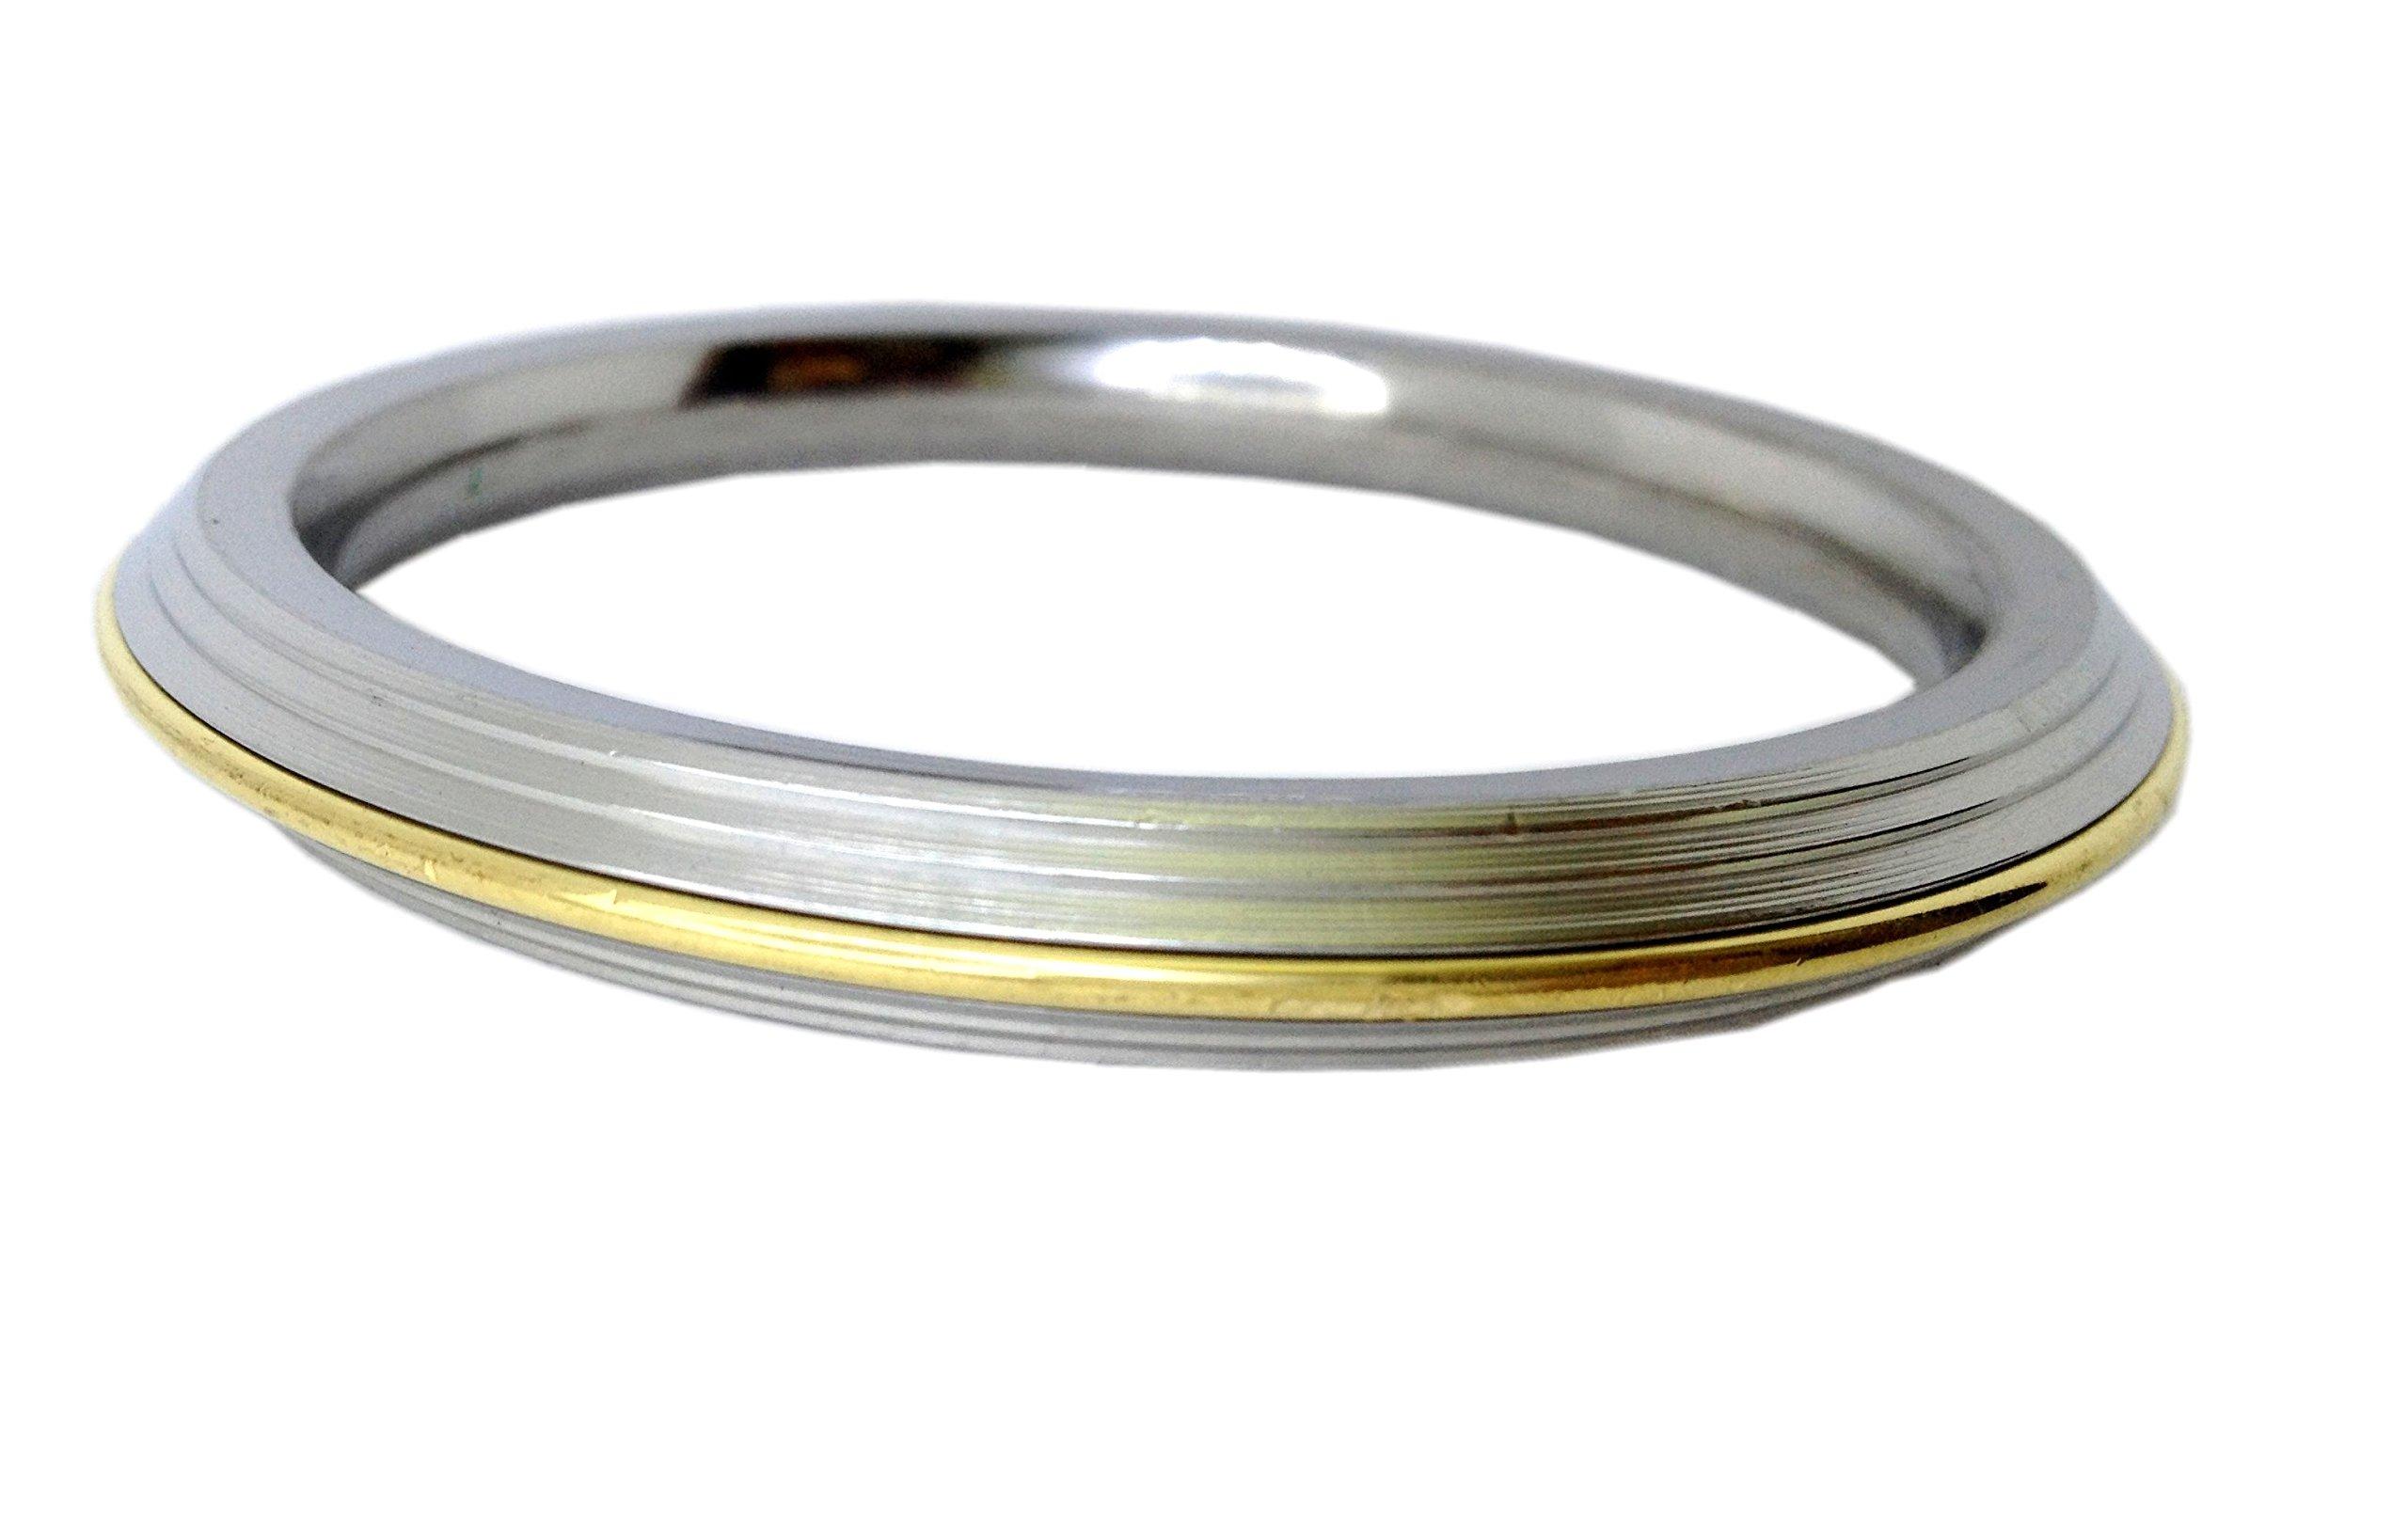 Brass & Stainless Steel Punjabi Kada Bracelet for Men (1 cm Thick) product image